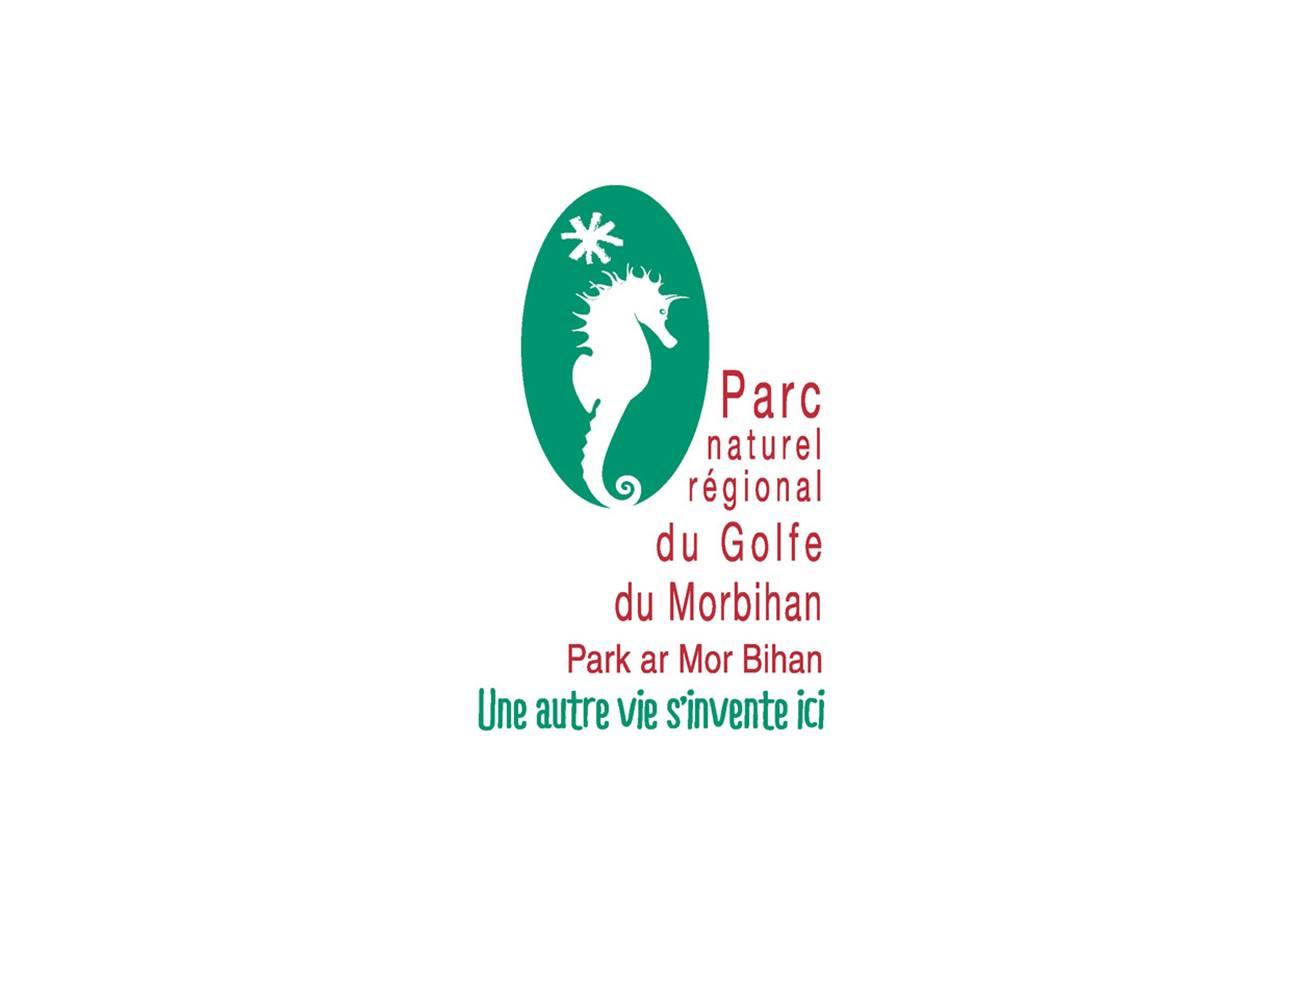 Logo-Parc-Naturel-Régional-du-Golfe-du-Morbihan-Bretagne sud © PNR Golfe du Morbihan